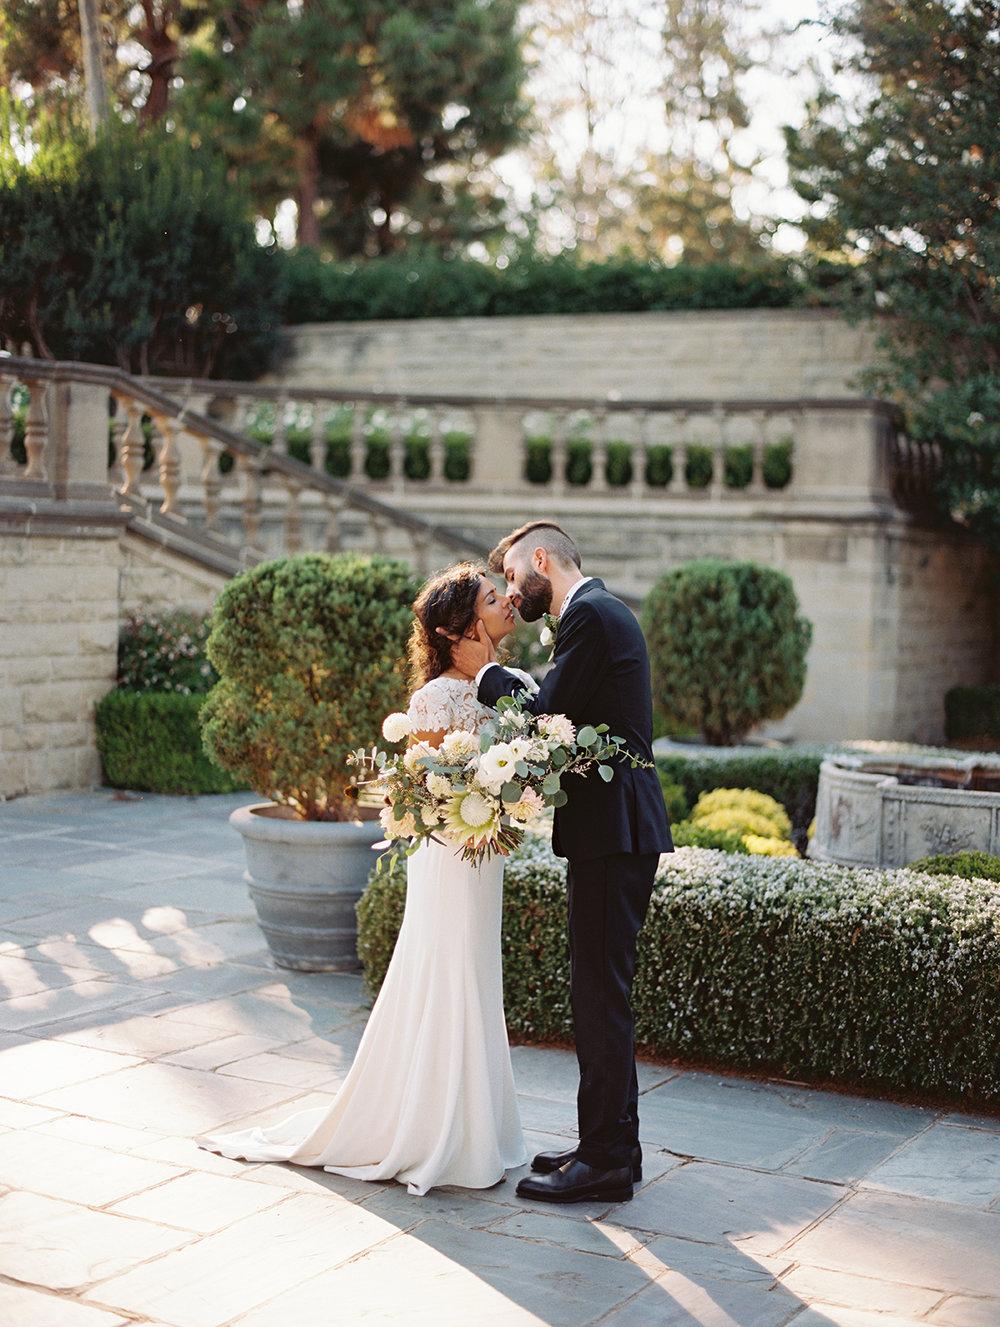 118-brian-sarra-los-angeles-wedding-brumley-wells-photography.jpg